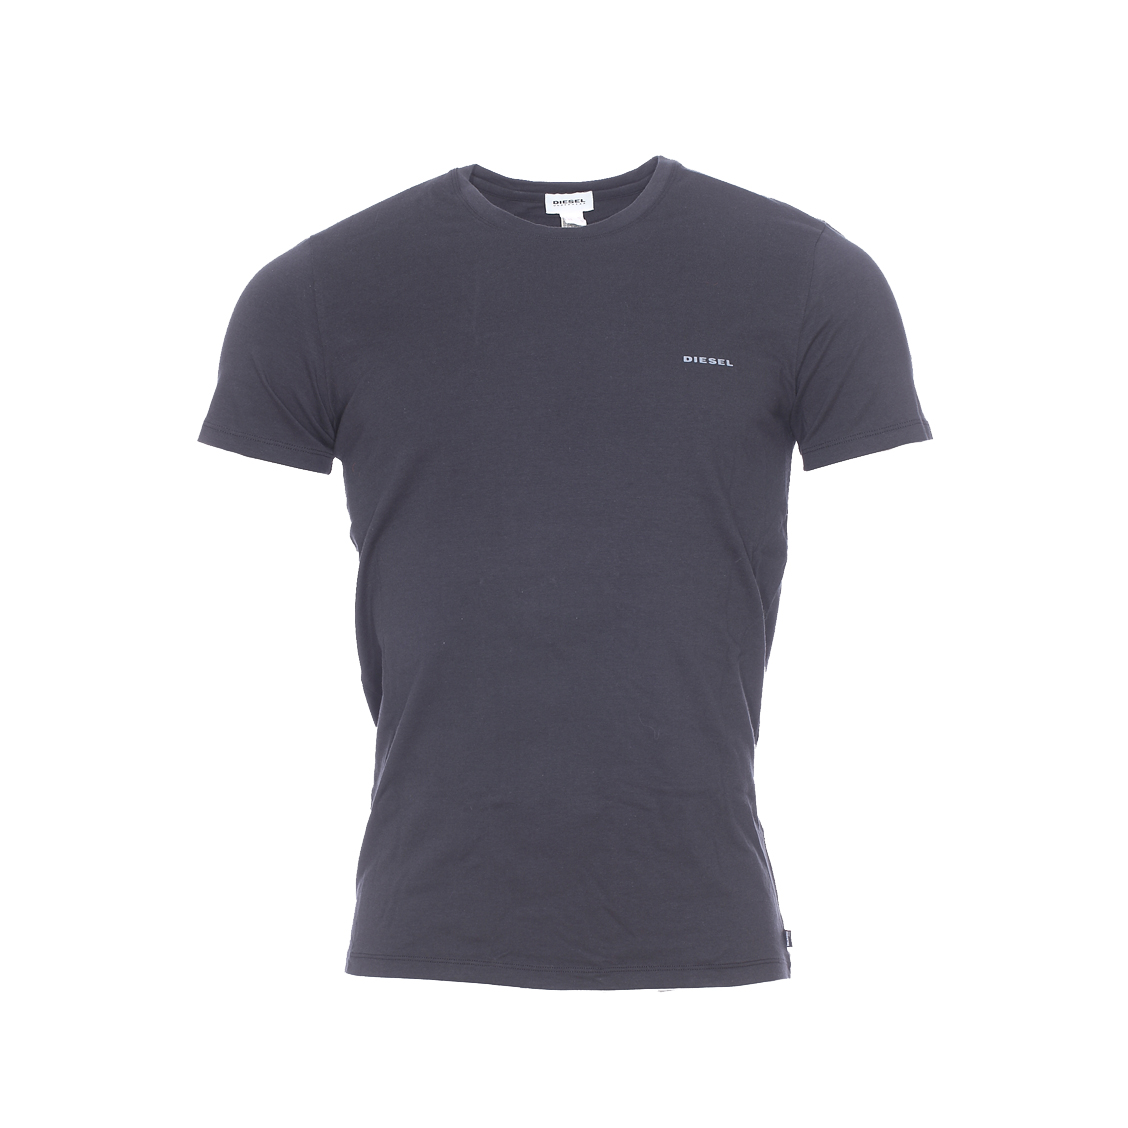 Tee-shirt col rond diesel en coton stretch noir